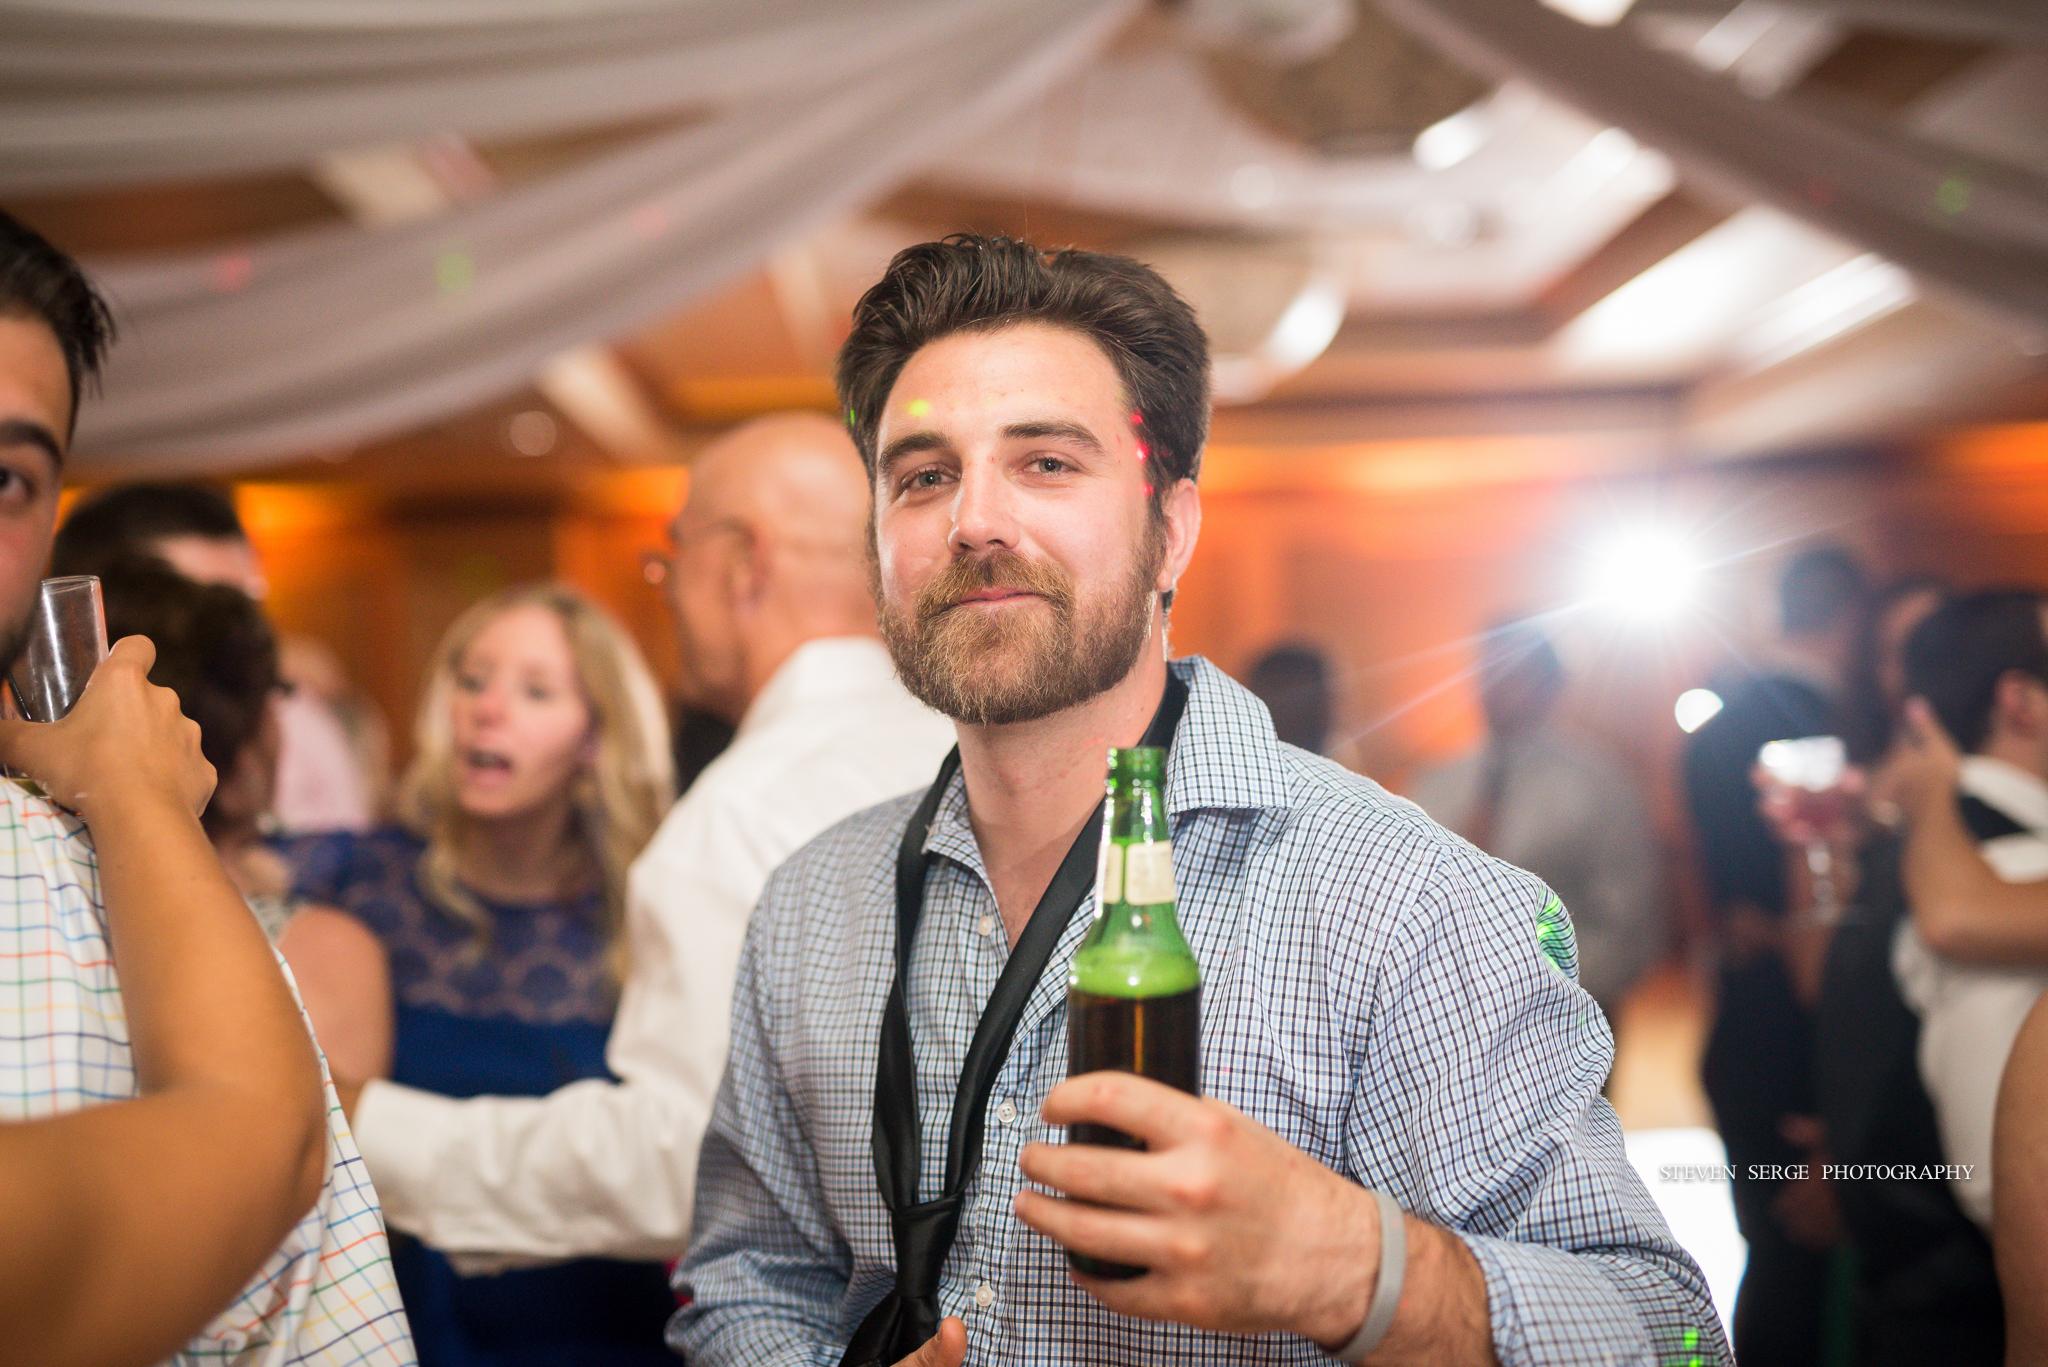 scranton-wedding-photographers-hilton-steven-serge-photography-33.jpg